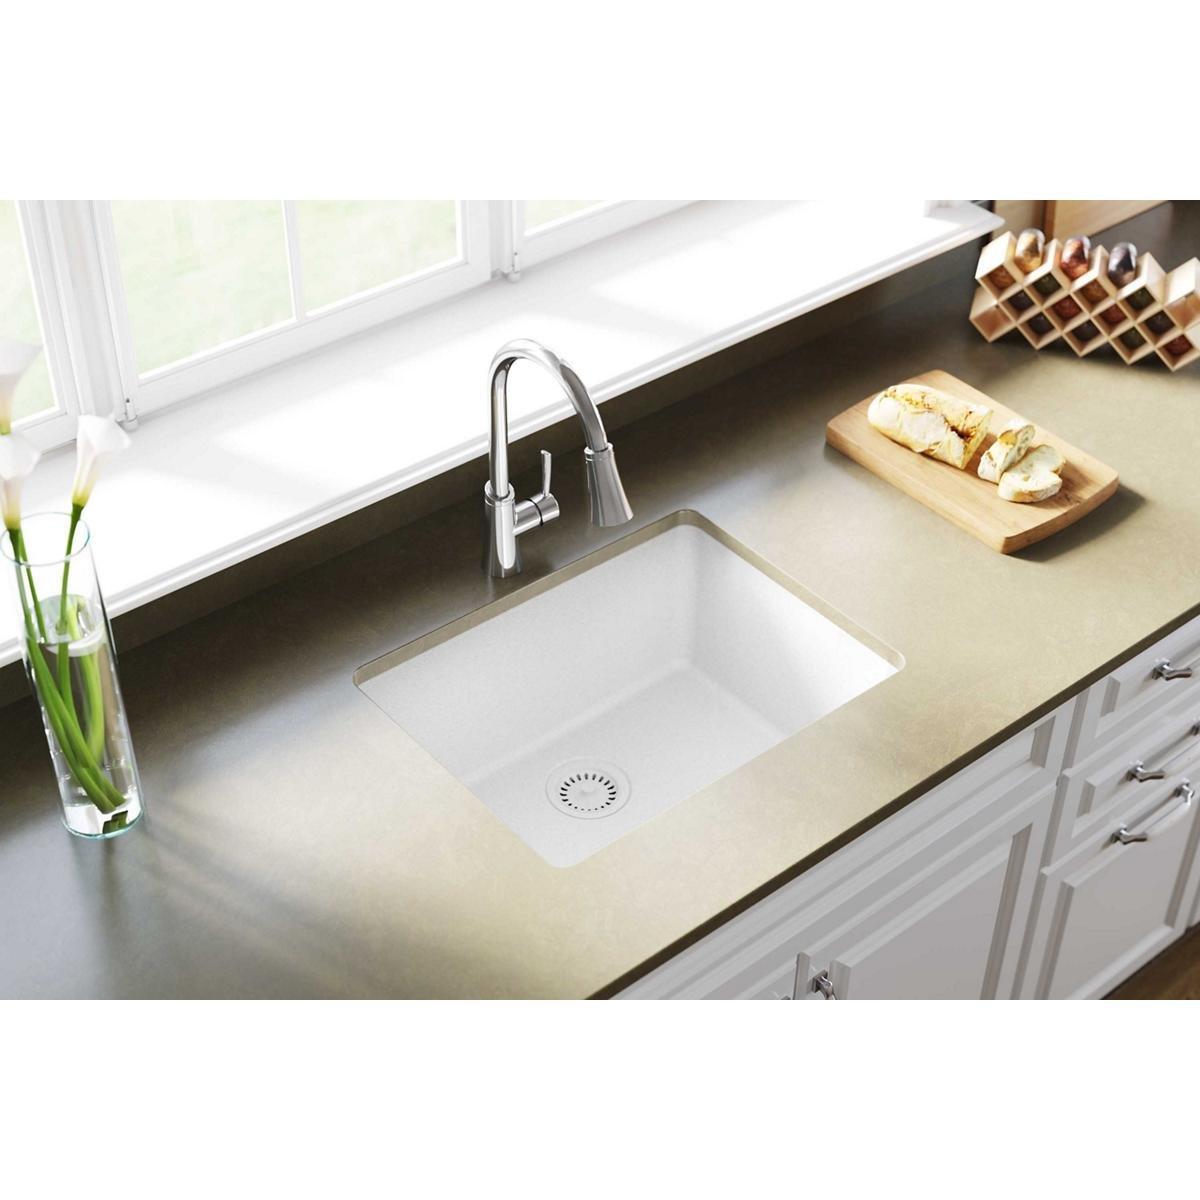 Elkay Quartz Classic ELGU2522WH0 Single Bowl Undermount Sink, White by Elkay (Image #2)